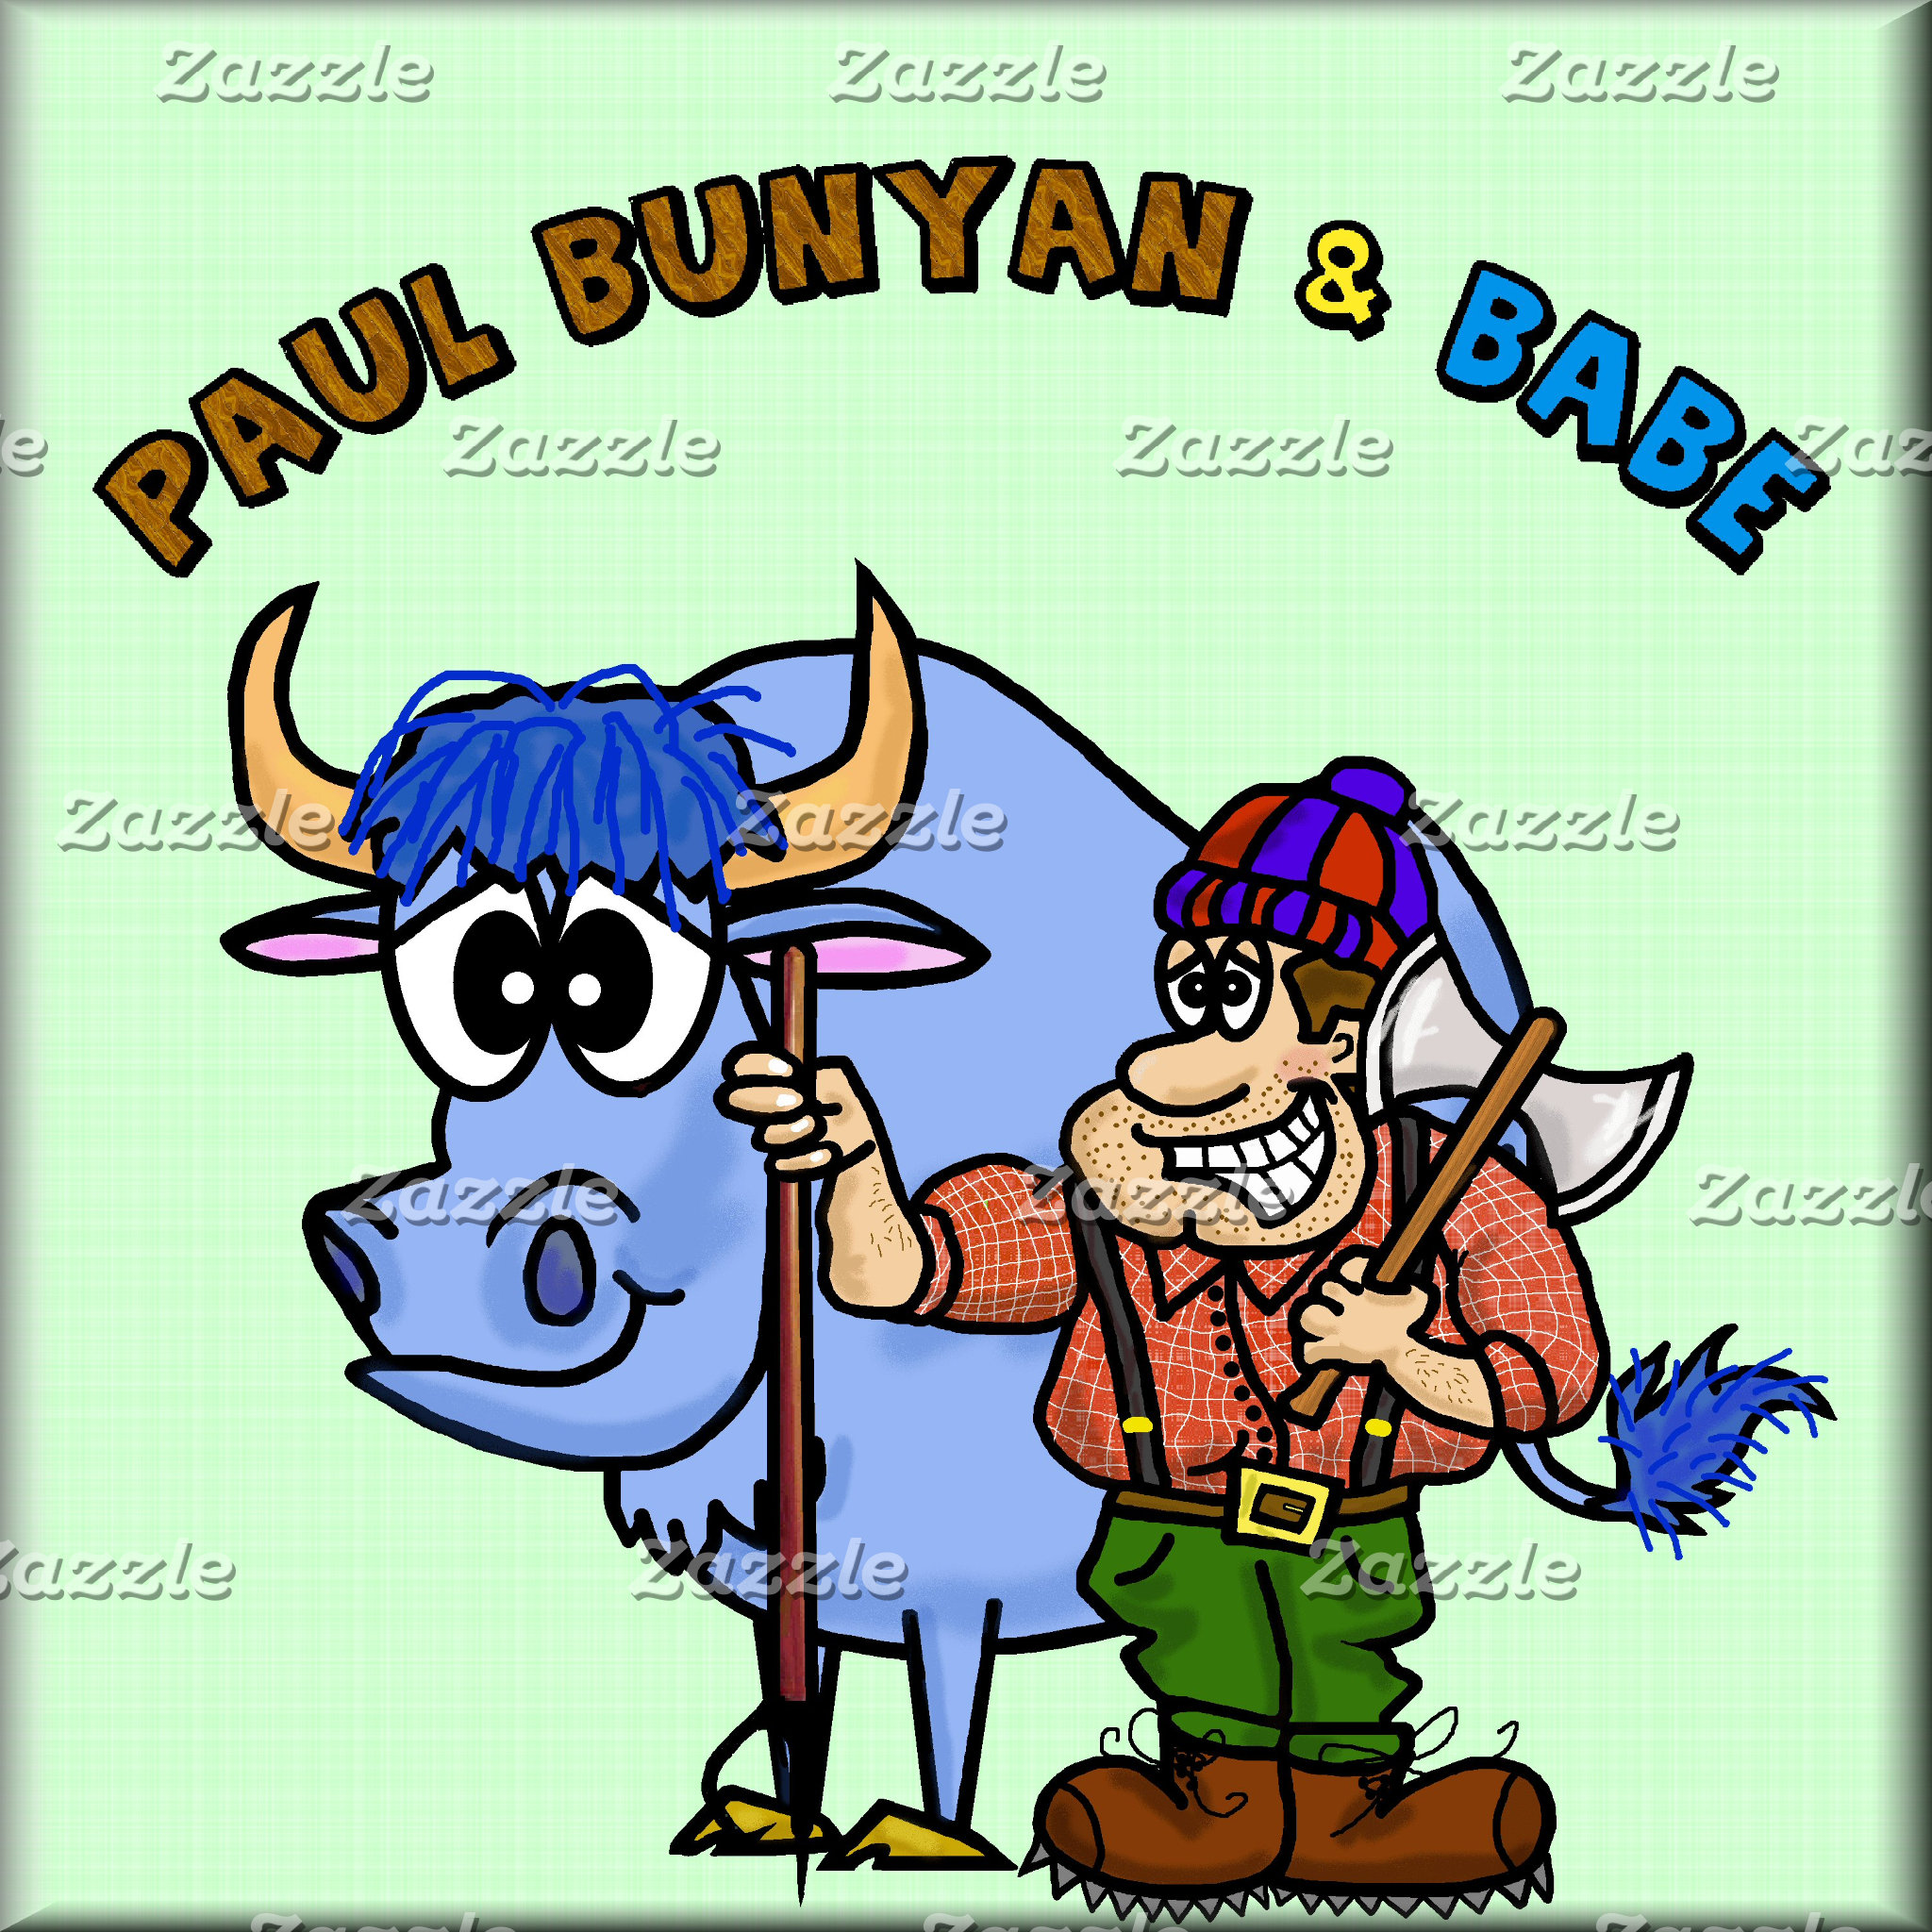 PAUL BUNYAN & Babe